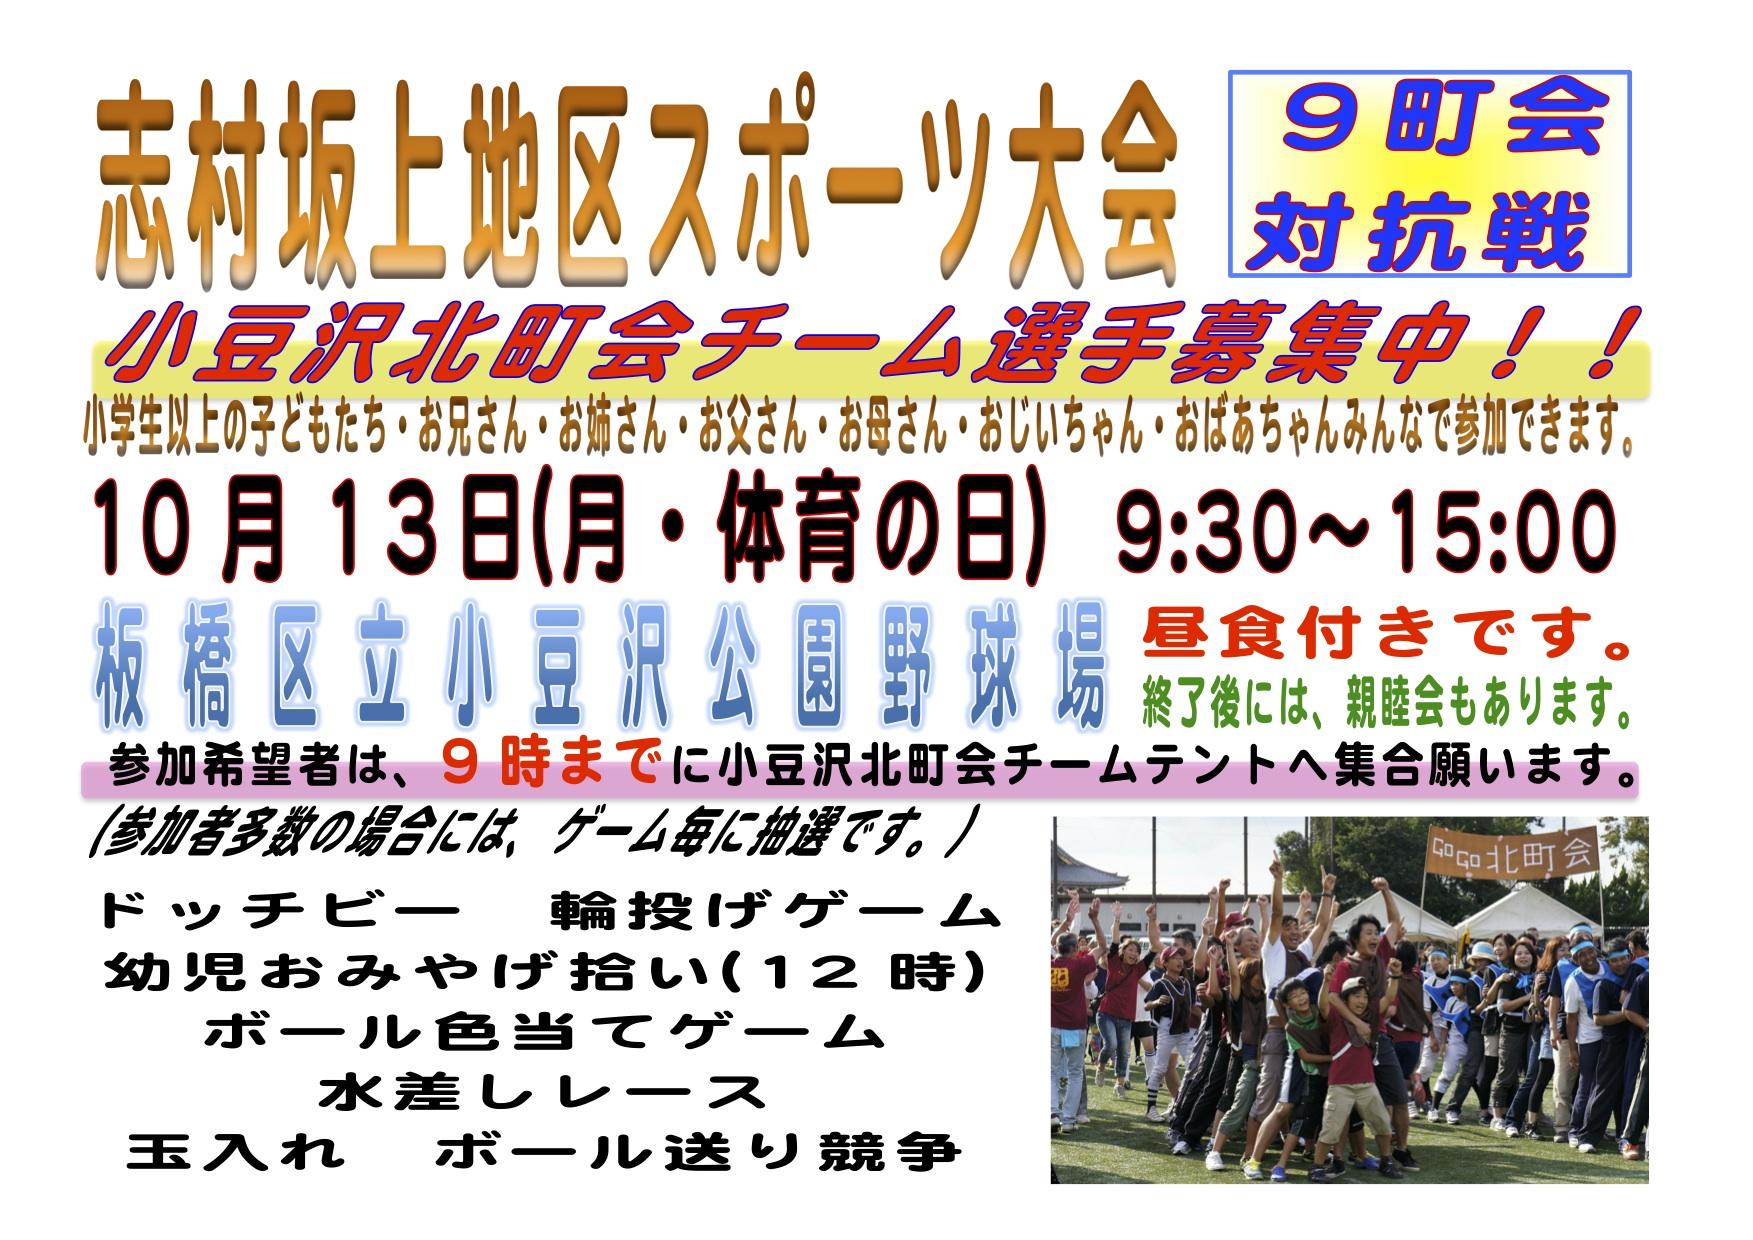 2014年10月13日(月・祝日)志村坂上地区スポーツ大会